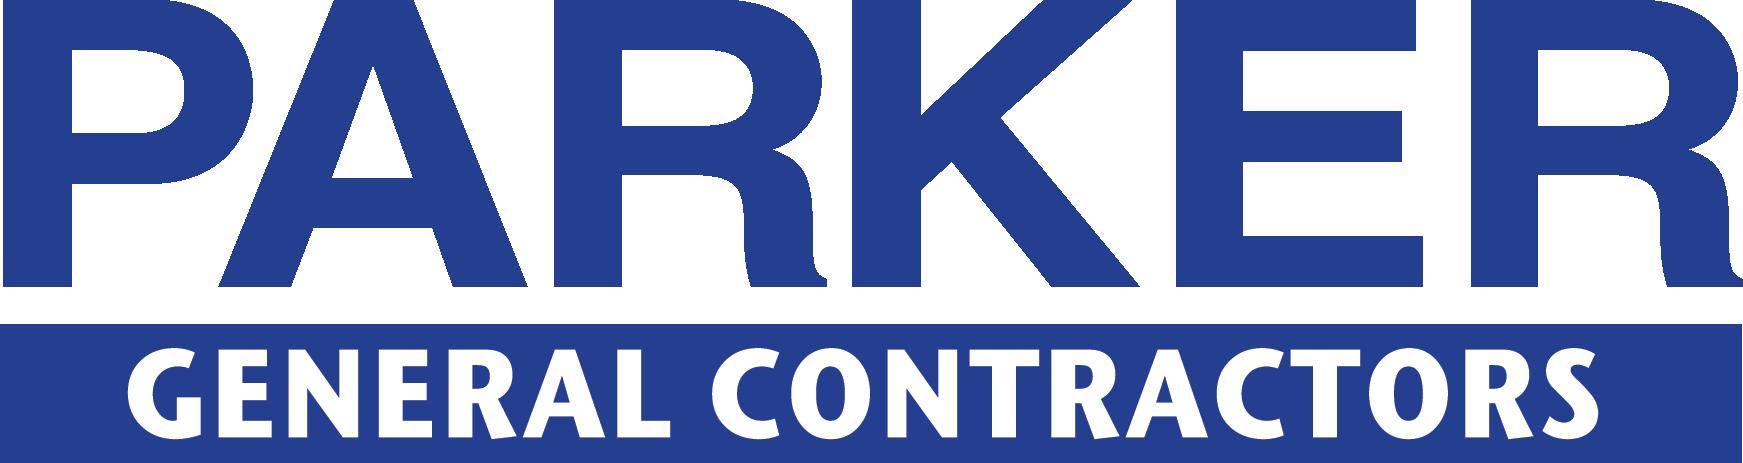 Parker General Contractors